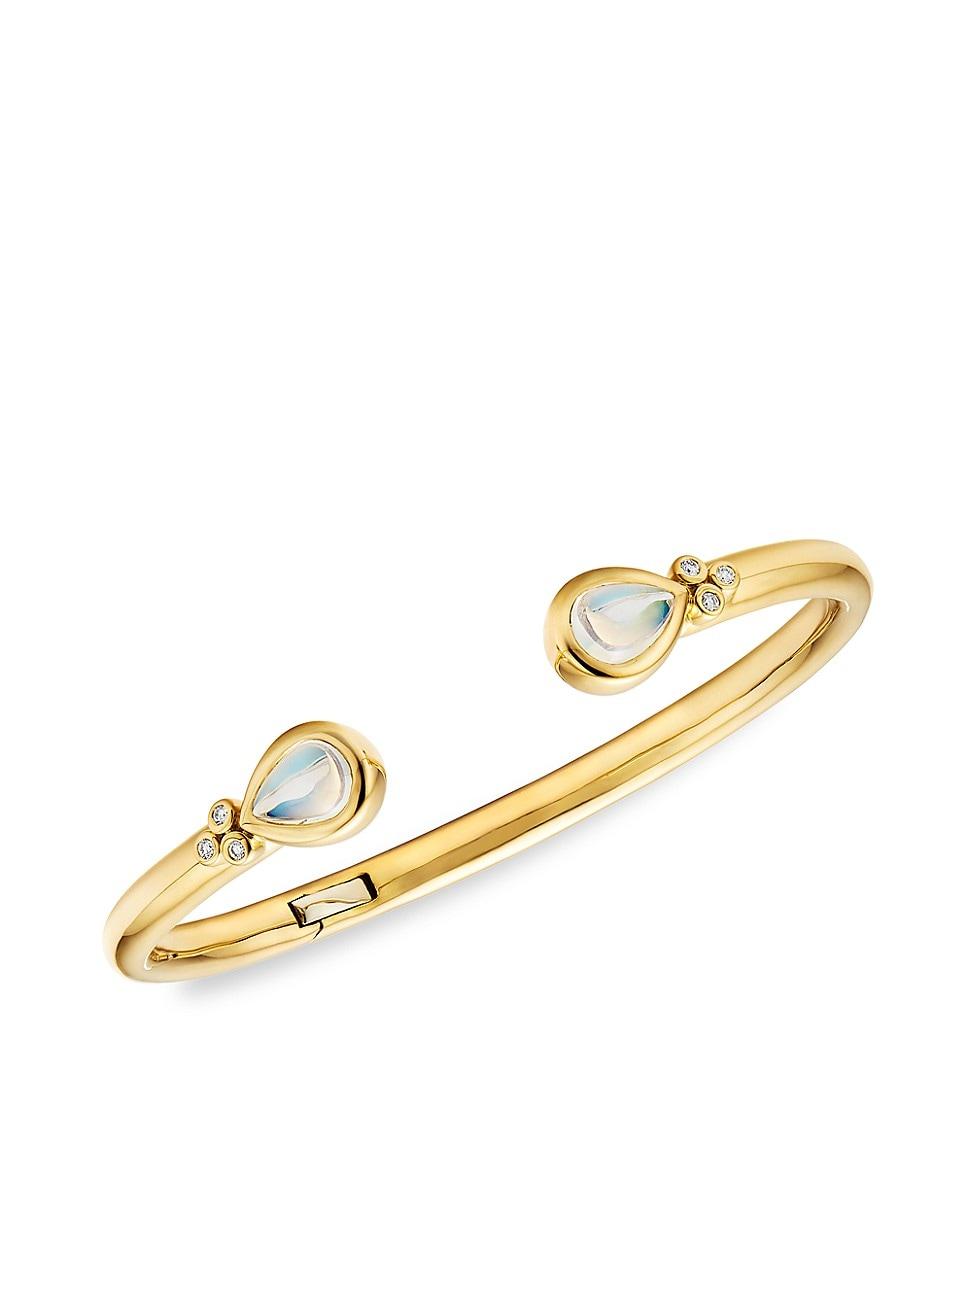 Temple St. Clair WOMEN'S CL COLOR BELLINA 18K YELLOW GOLD, BLUE MOONSTONE & DIAMOND CUFF BRACELET